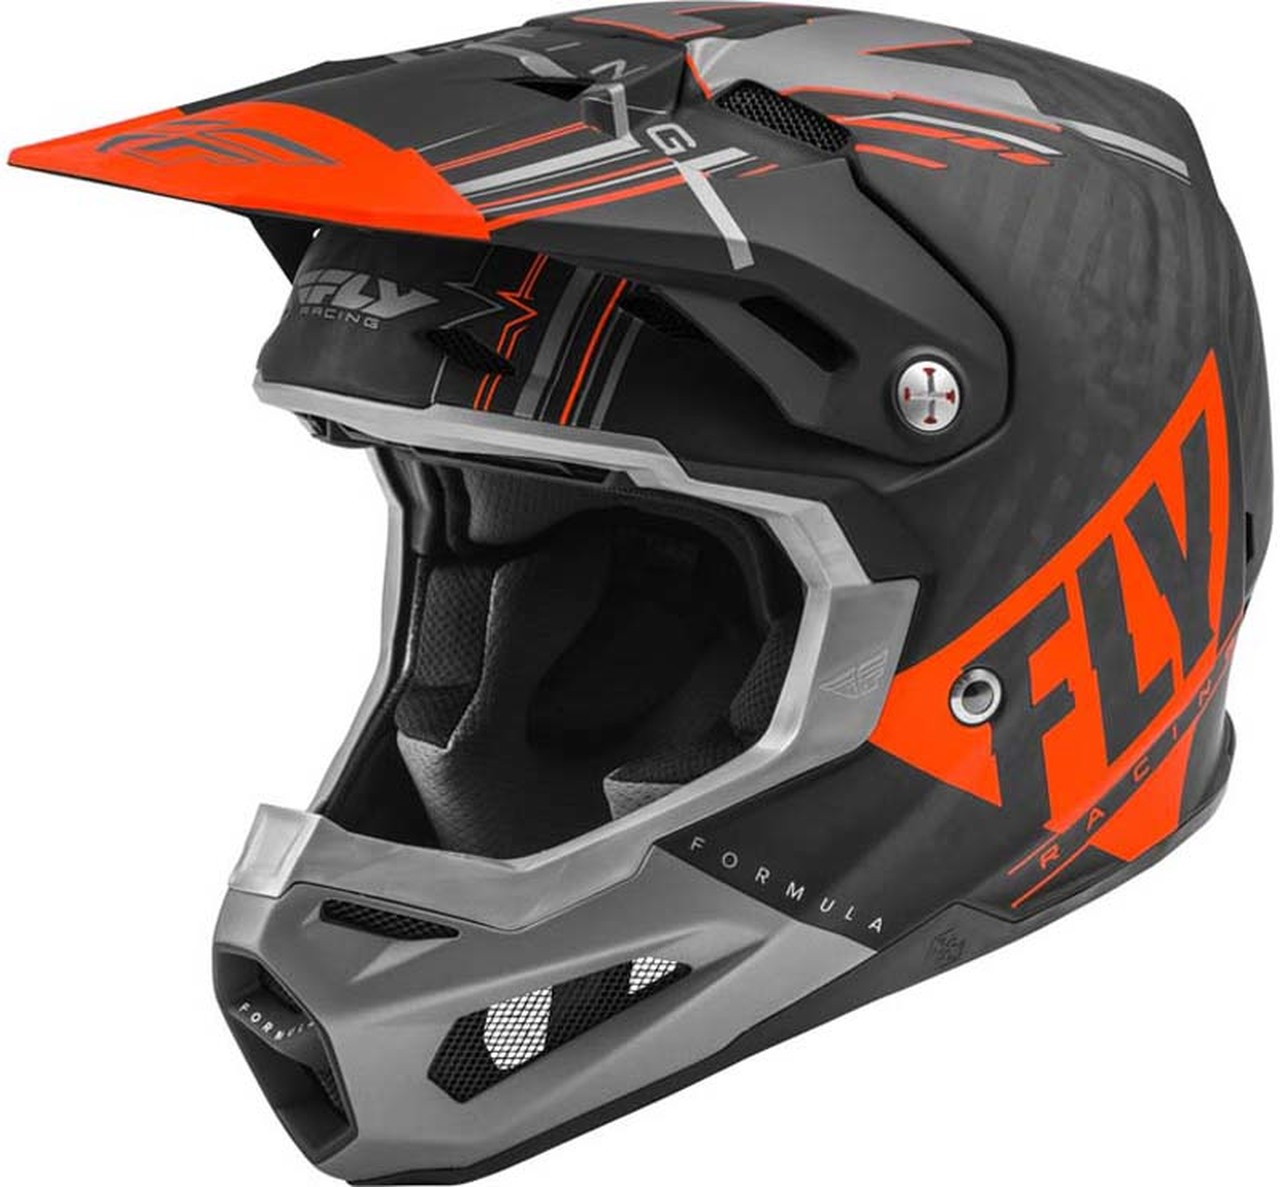 Fly Formula Vector Helmet - Orange Image